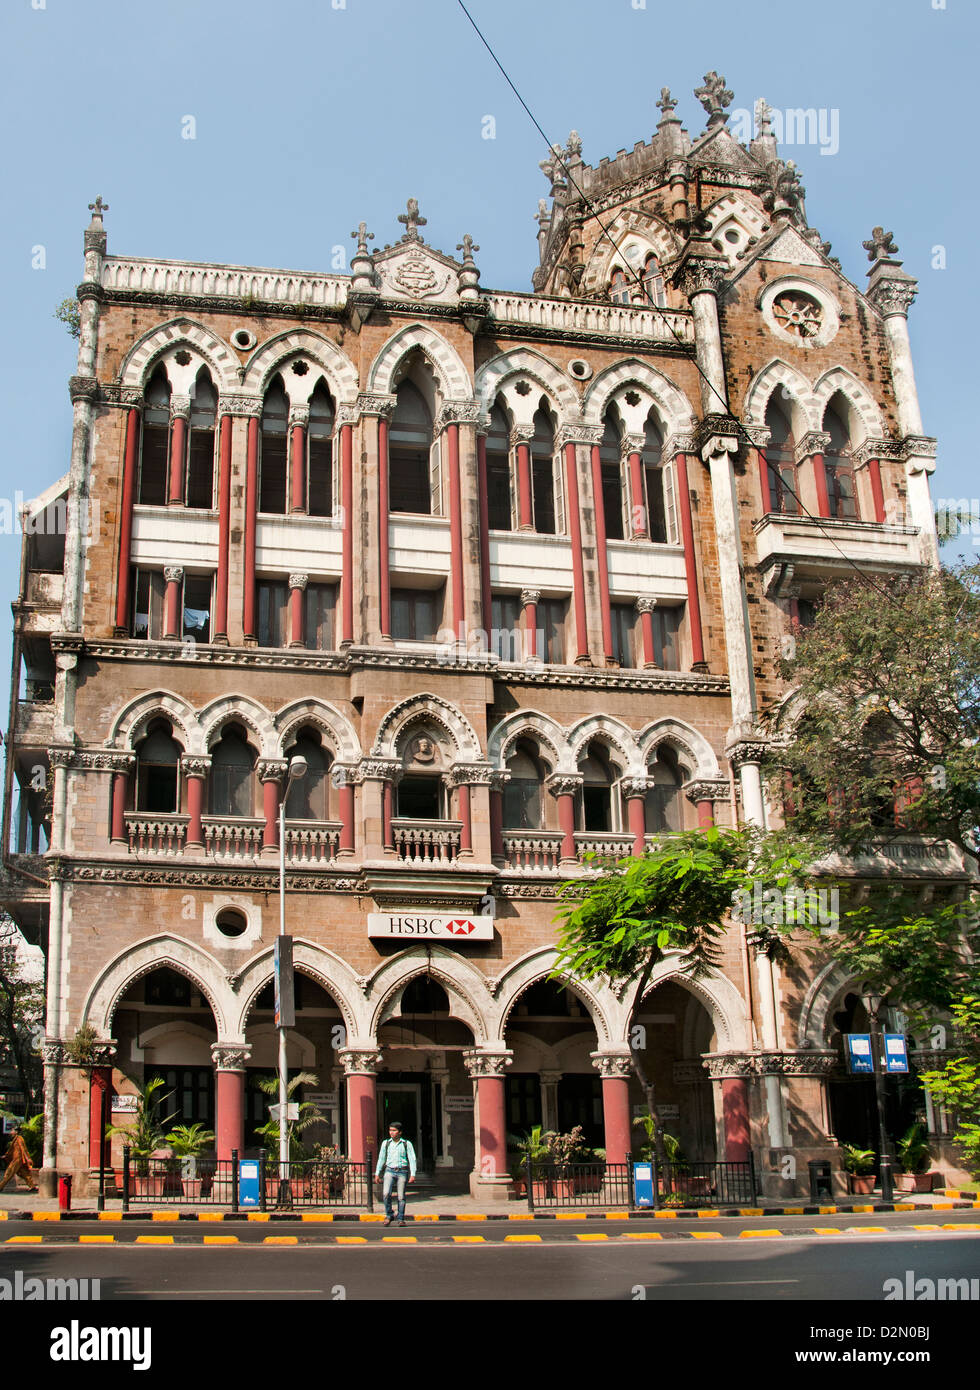 La Banque HSBC D N Road Mumbai ( Bombay ) Inde Fort Photo Stock